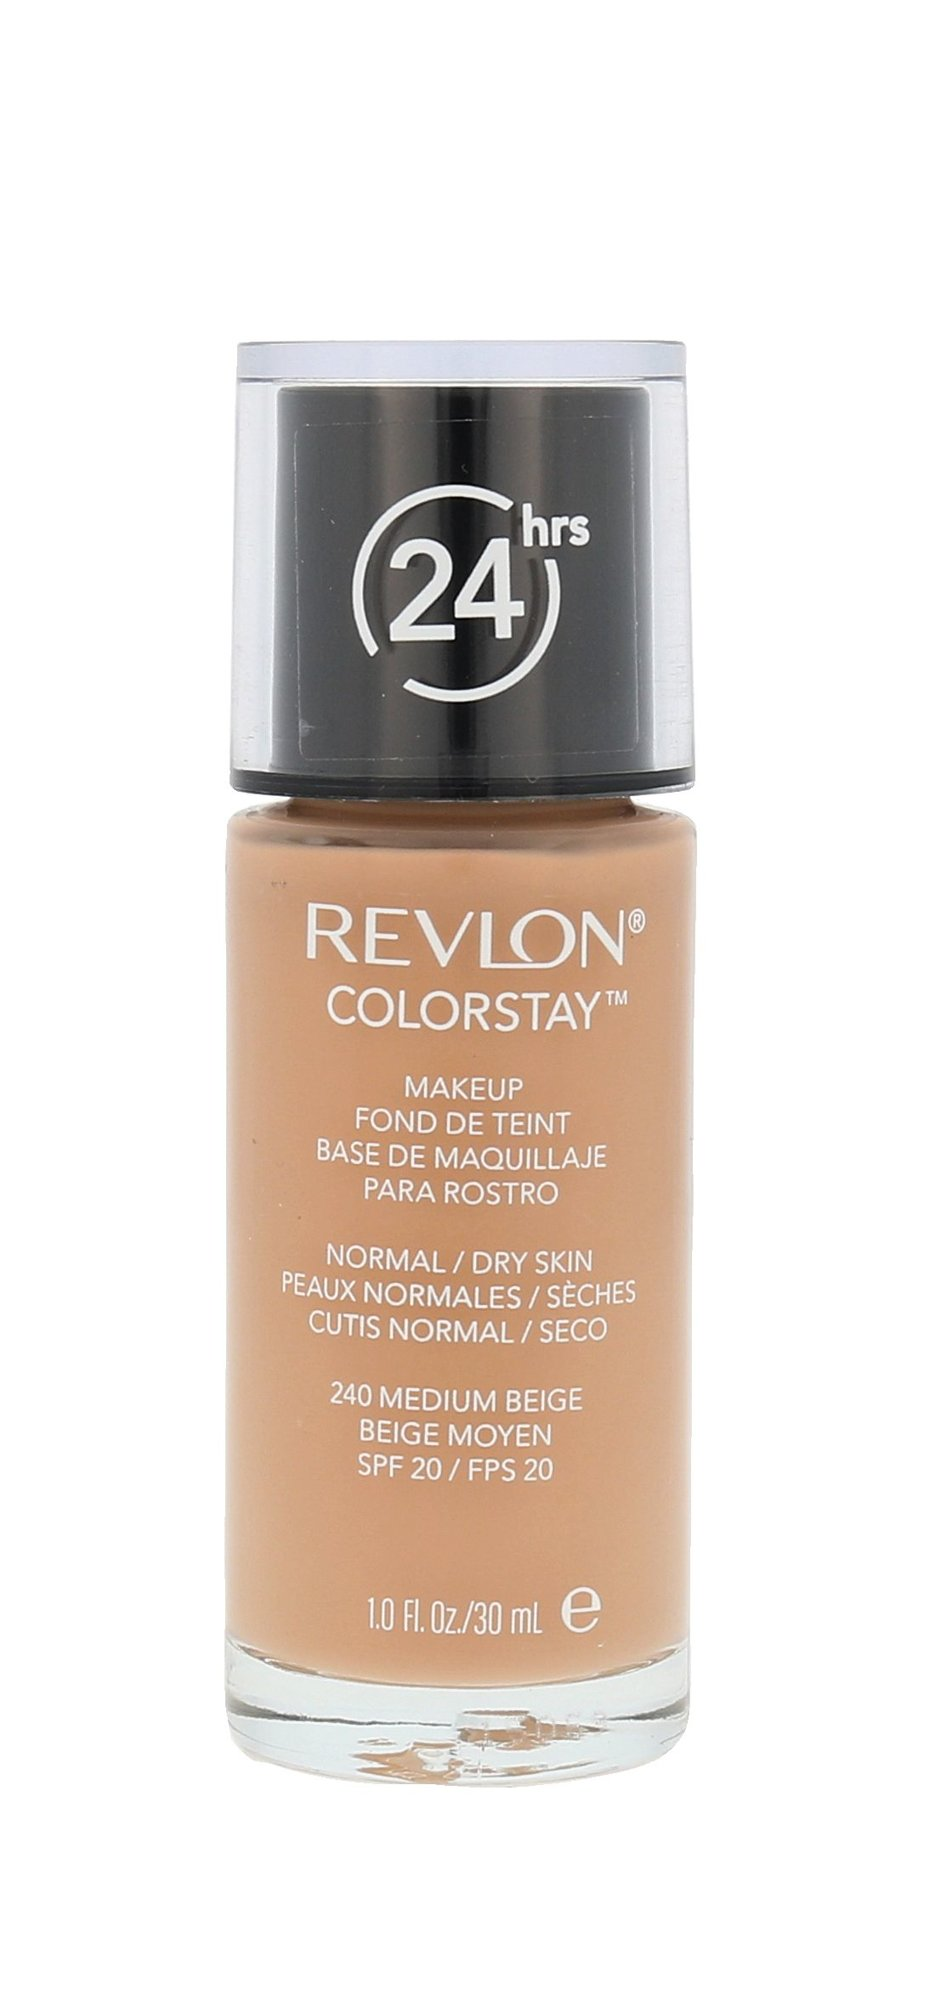 Revlon Colorstay Cosmetic 30ml 240 Medium Beige